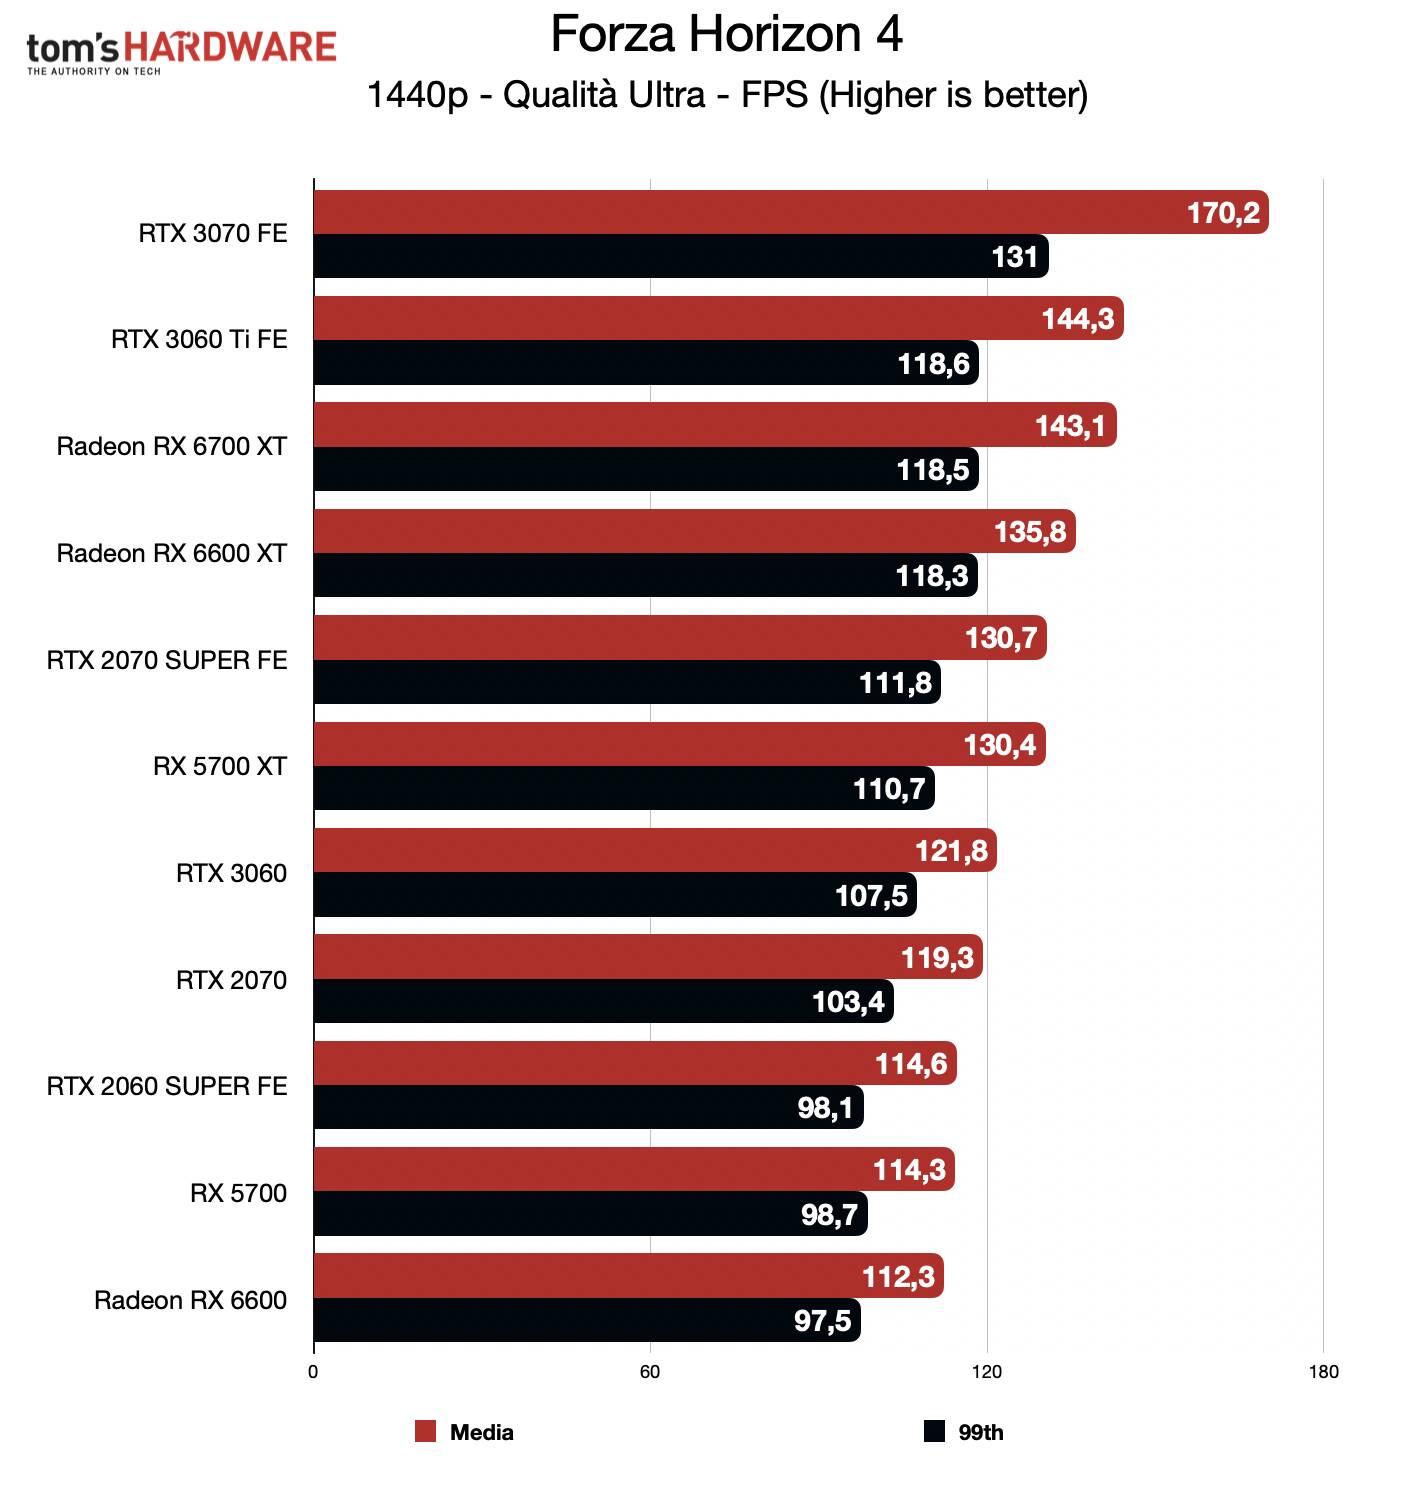 Benchmark Radeon RX 6600 - QHD - Forza Horizon 4